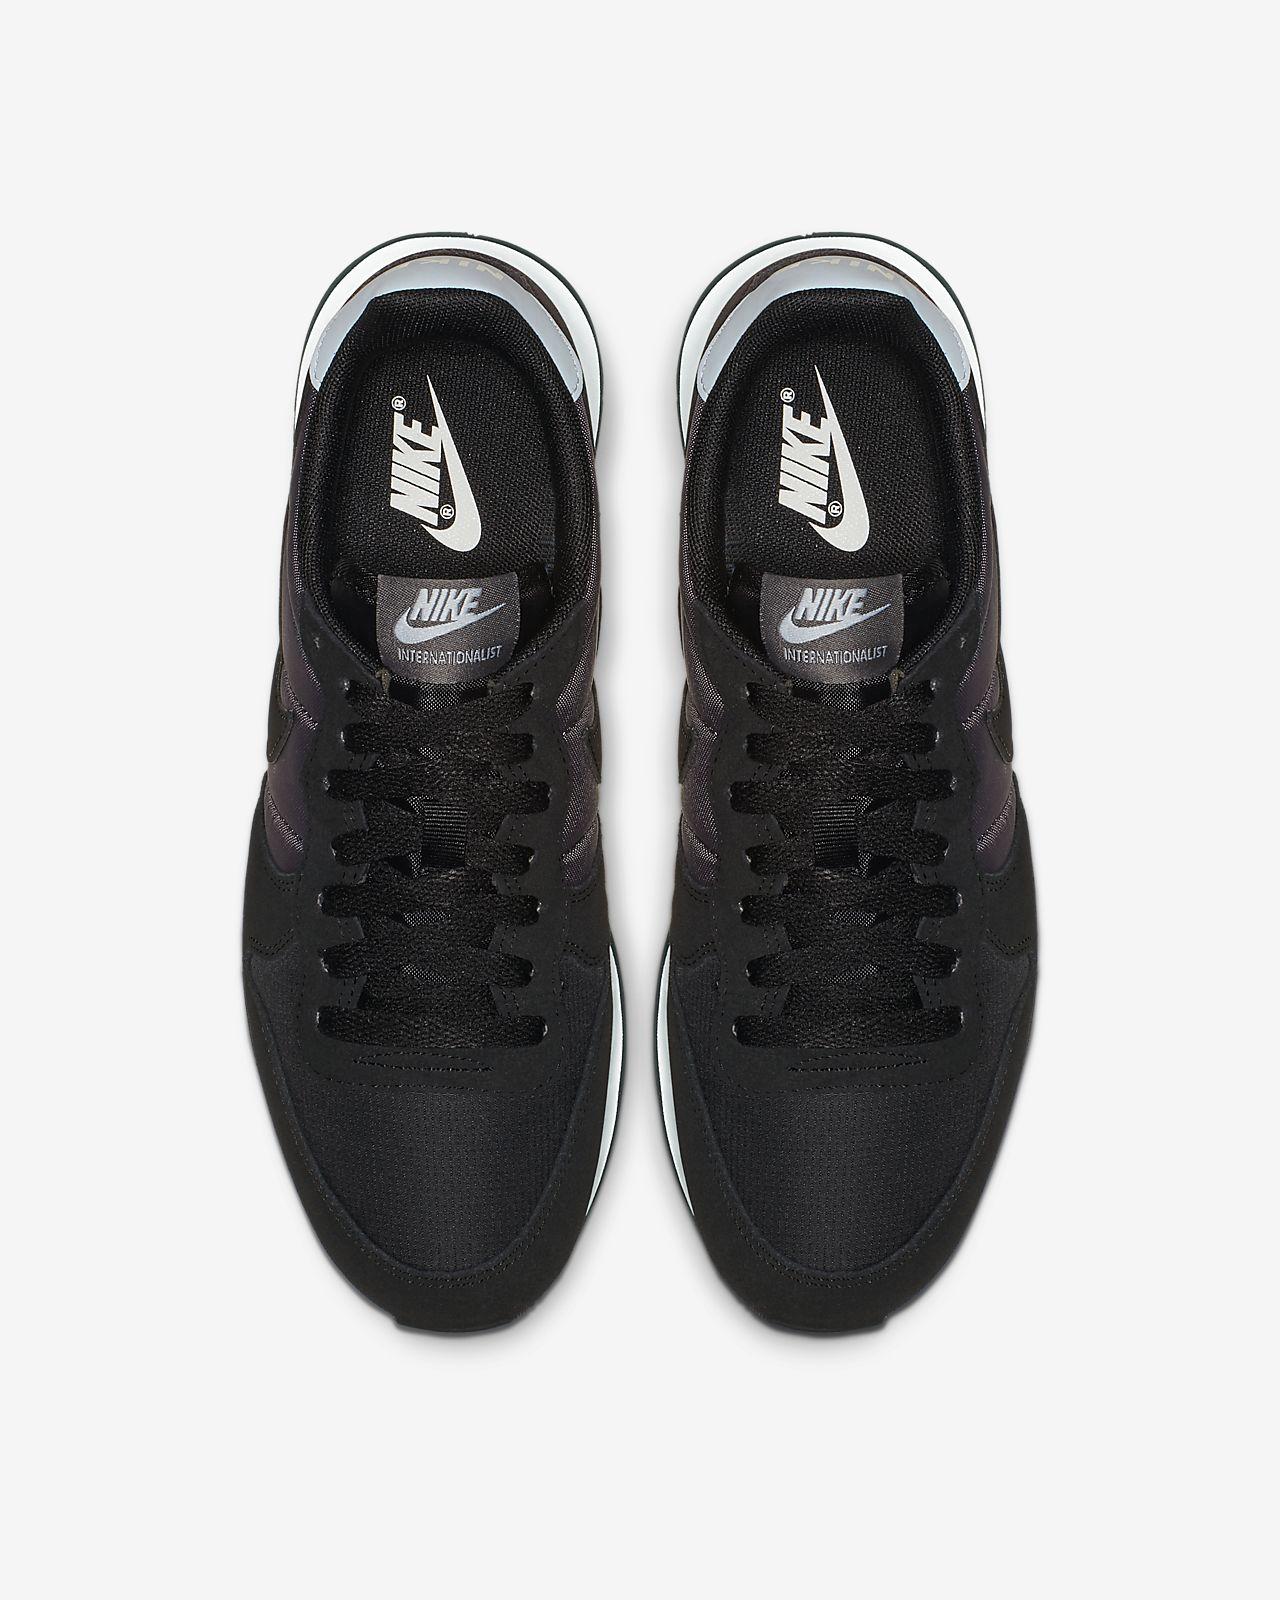 wholesale dealer 224c3 72142 Low Resolution Nike Internationalist Damenschuh Nike Internationalist  Damenschuh